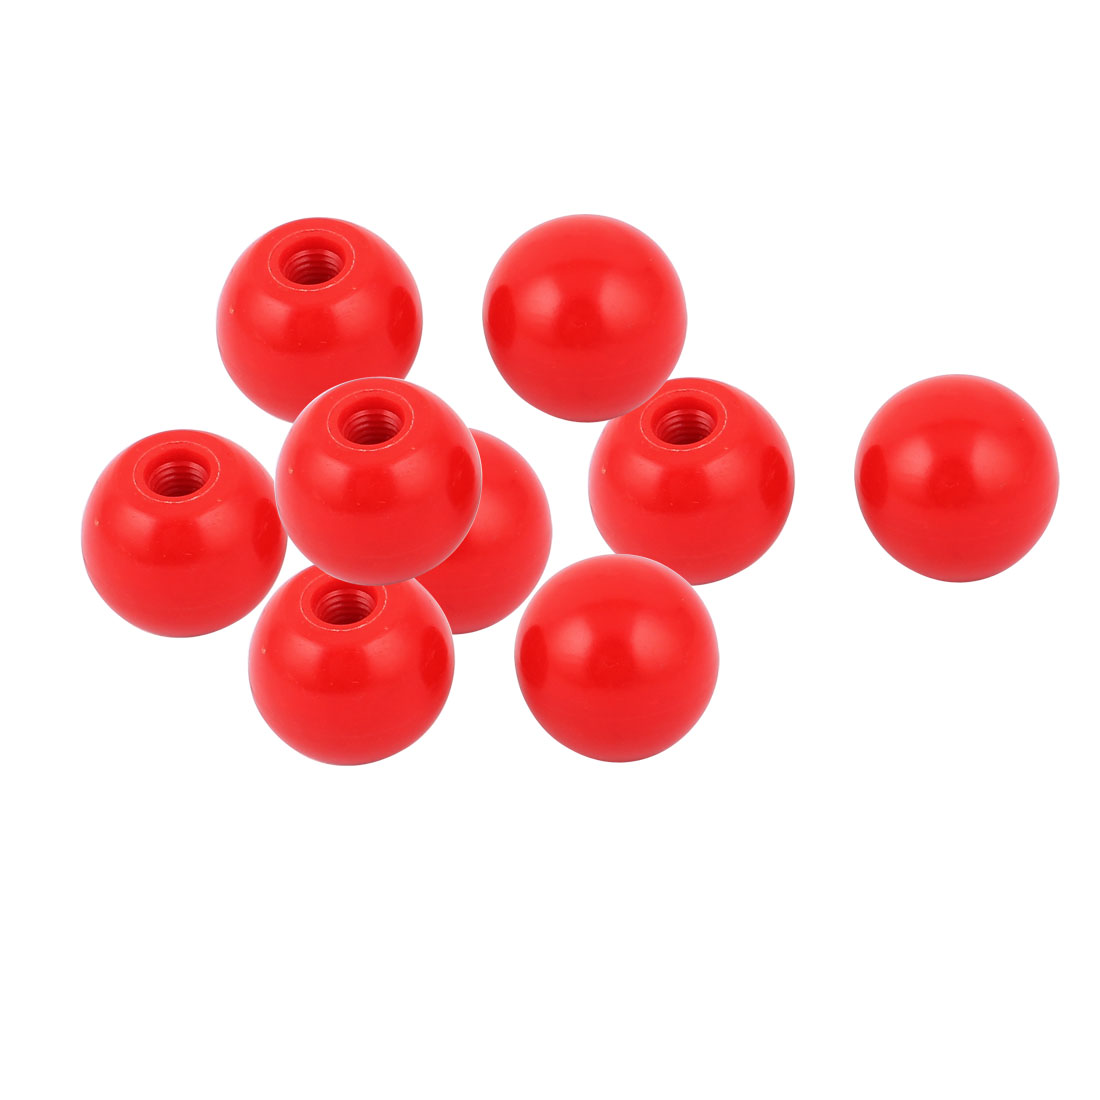 9 Pcs M10 Thread Round Plastic 35mm Diameter Ball Knob Handle Red